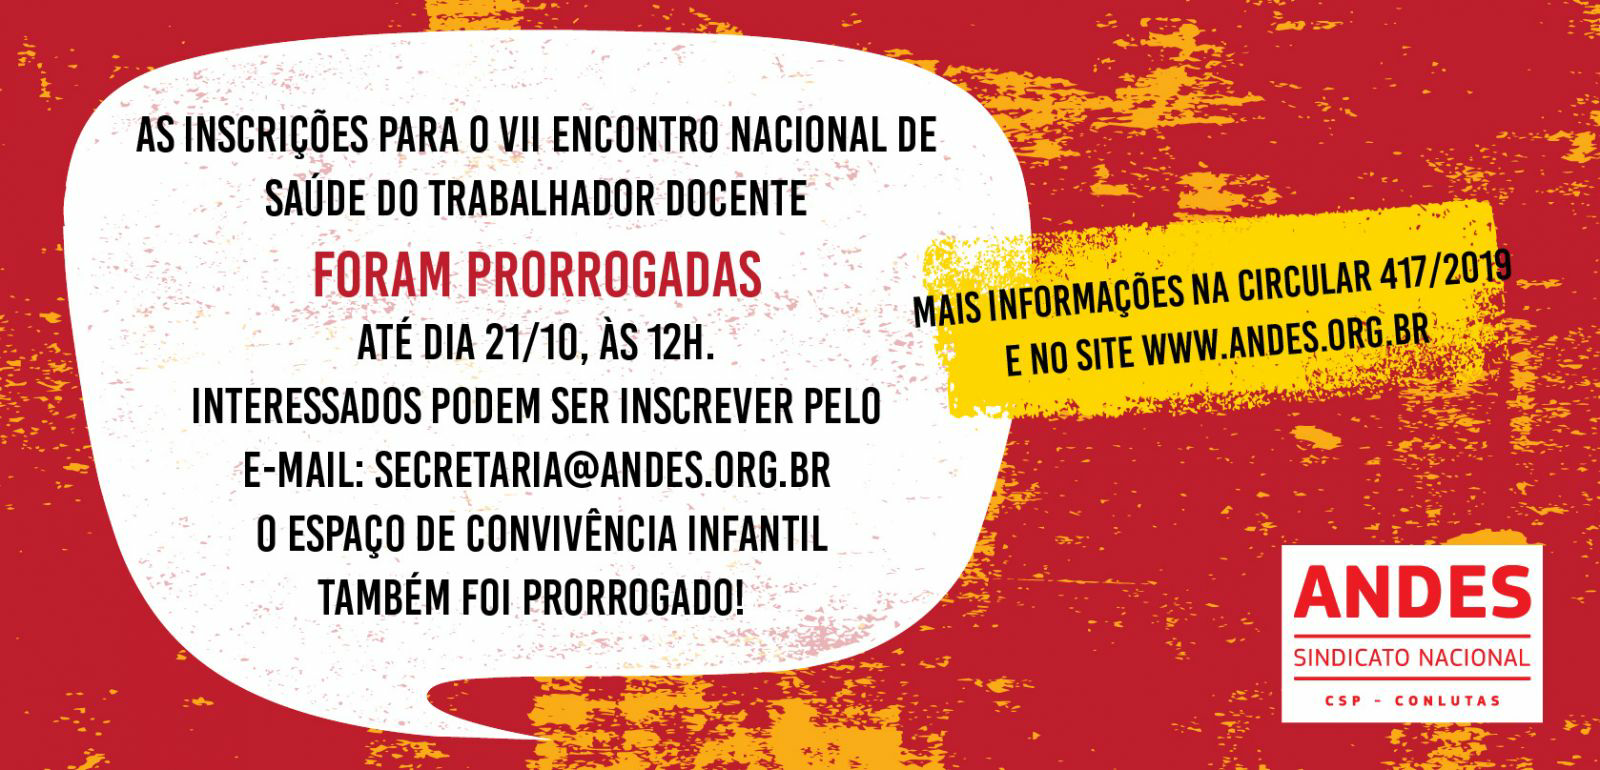 ANDES-SN realiza VII Encontro Nacional de Saúde do Trabalhador Docente